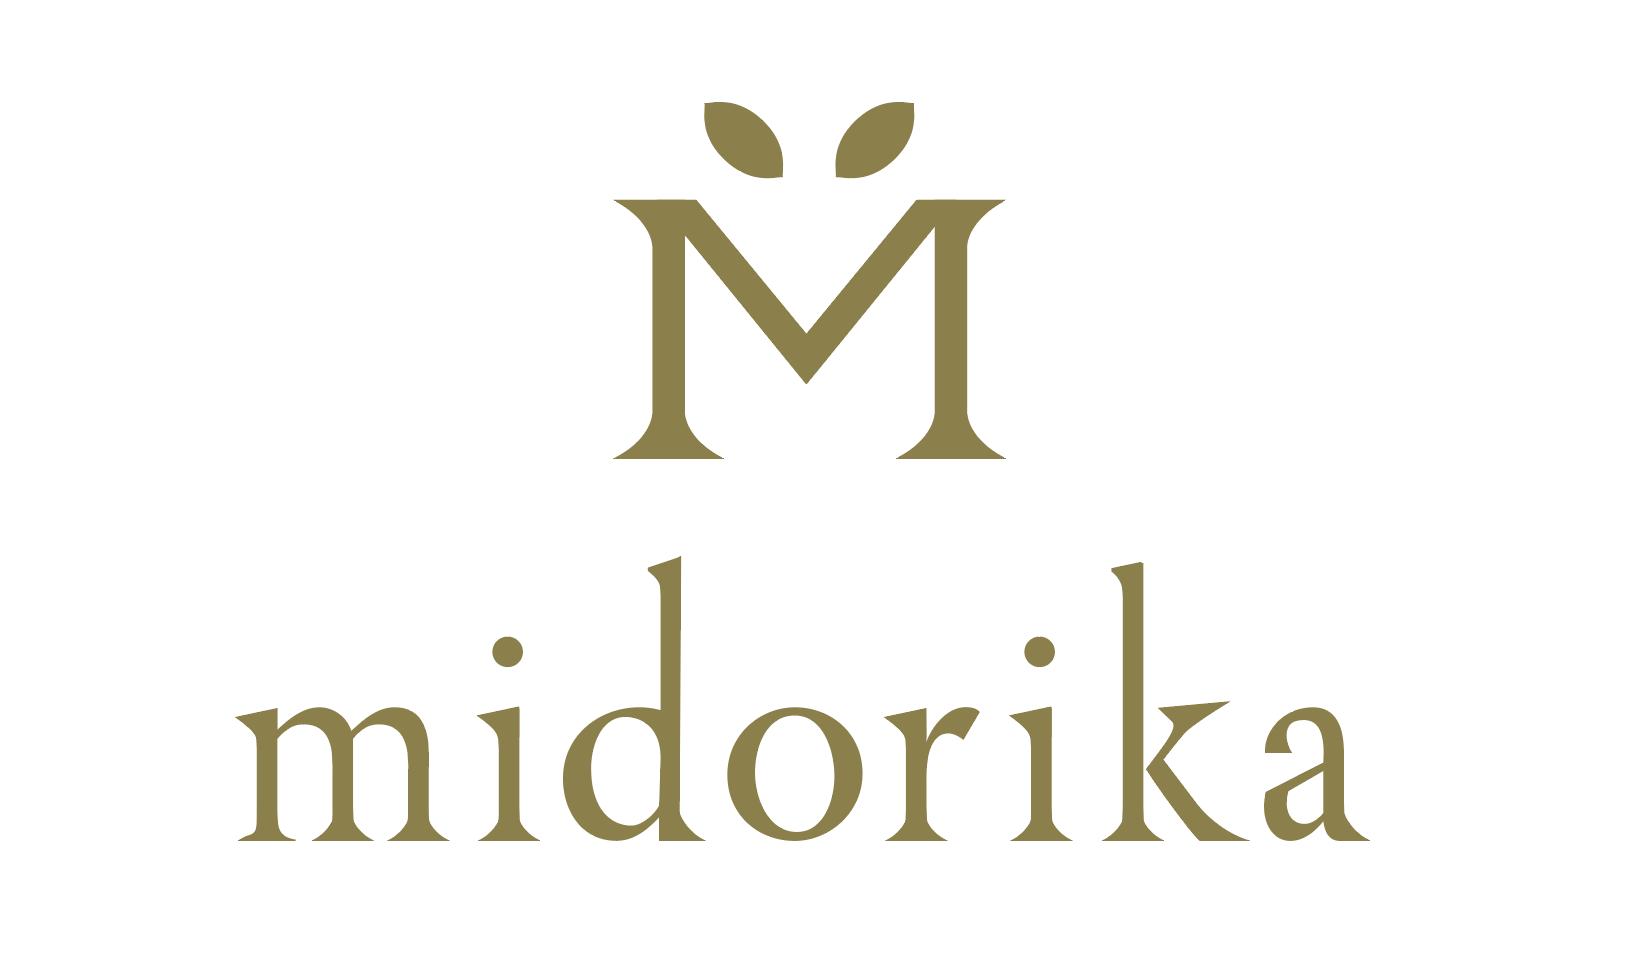 midorikalogomark3.png